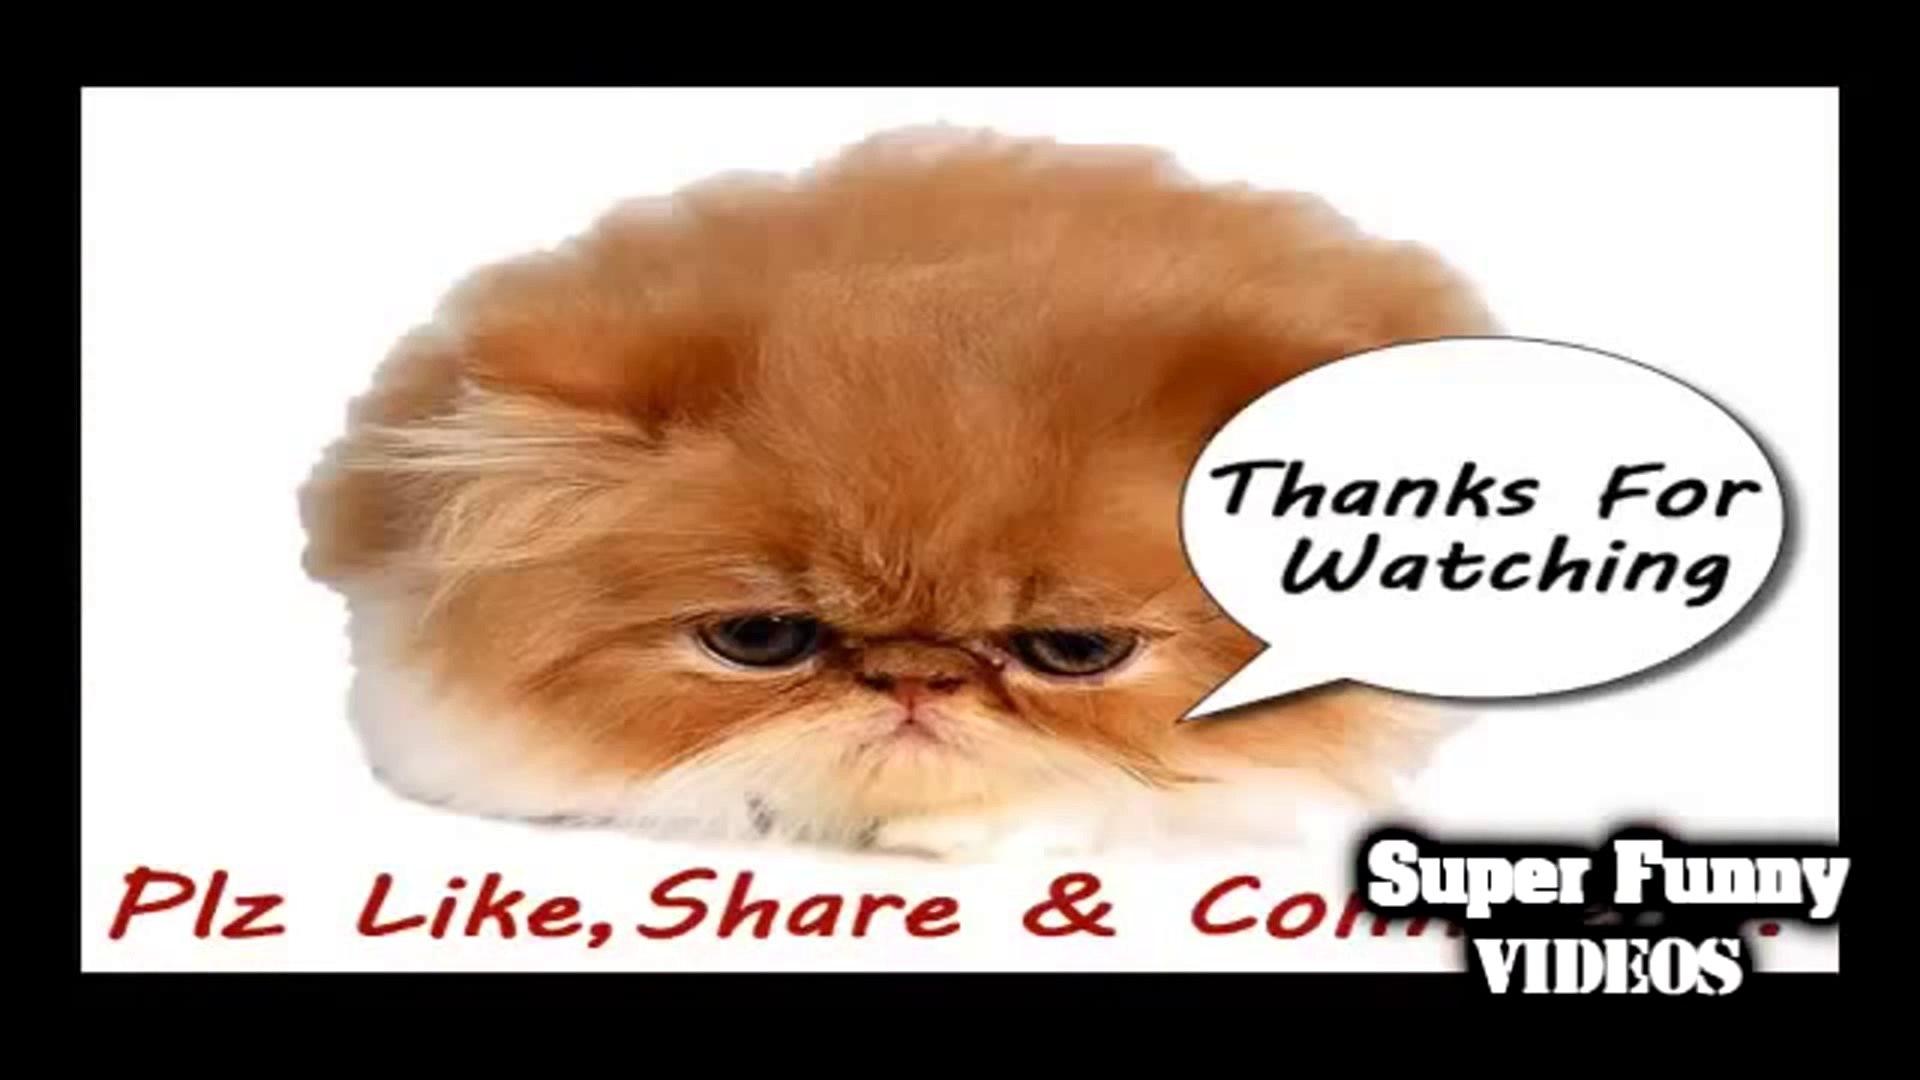 Funny cats vines 2014 - Best of funny cats vines 2014 - Funny cats talking - NEW(Risingformuli)